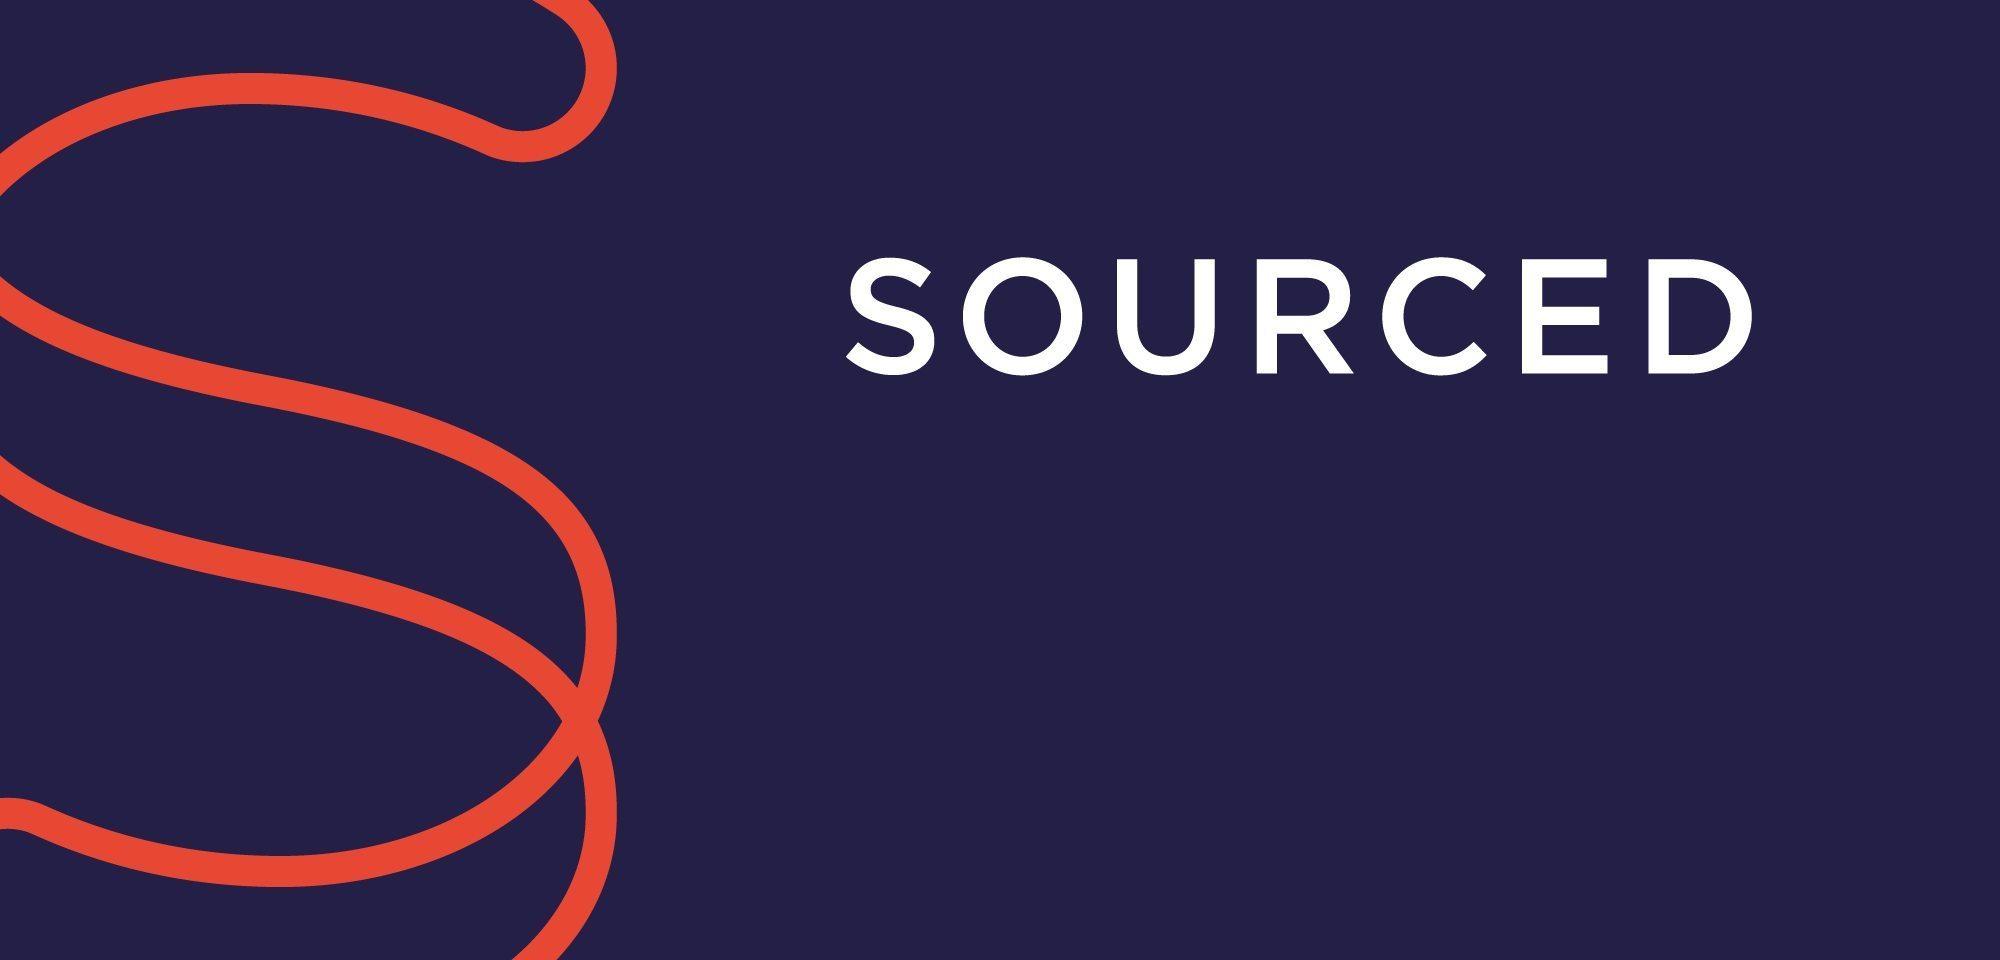 Sourced Branding